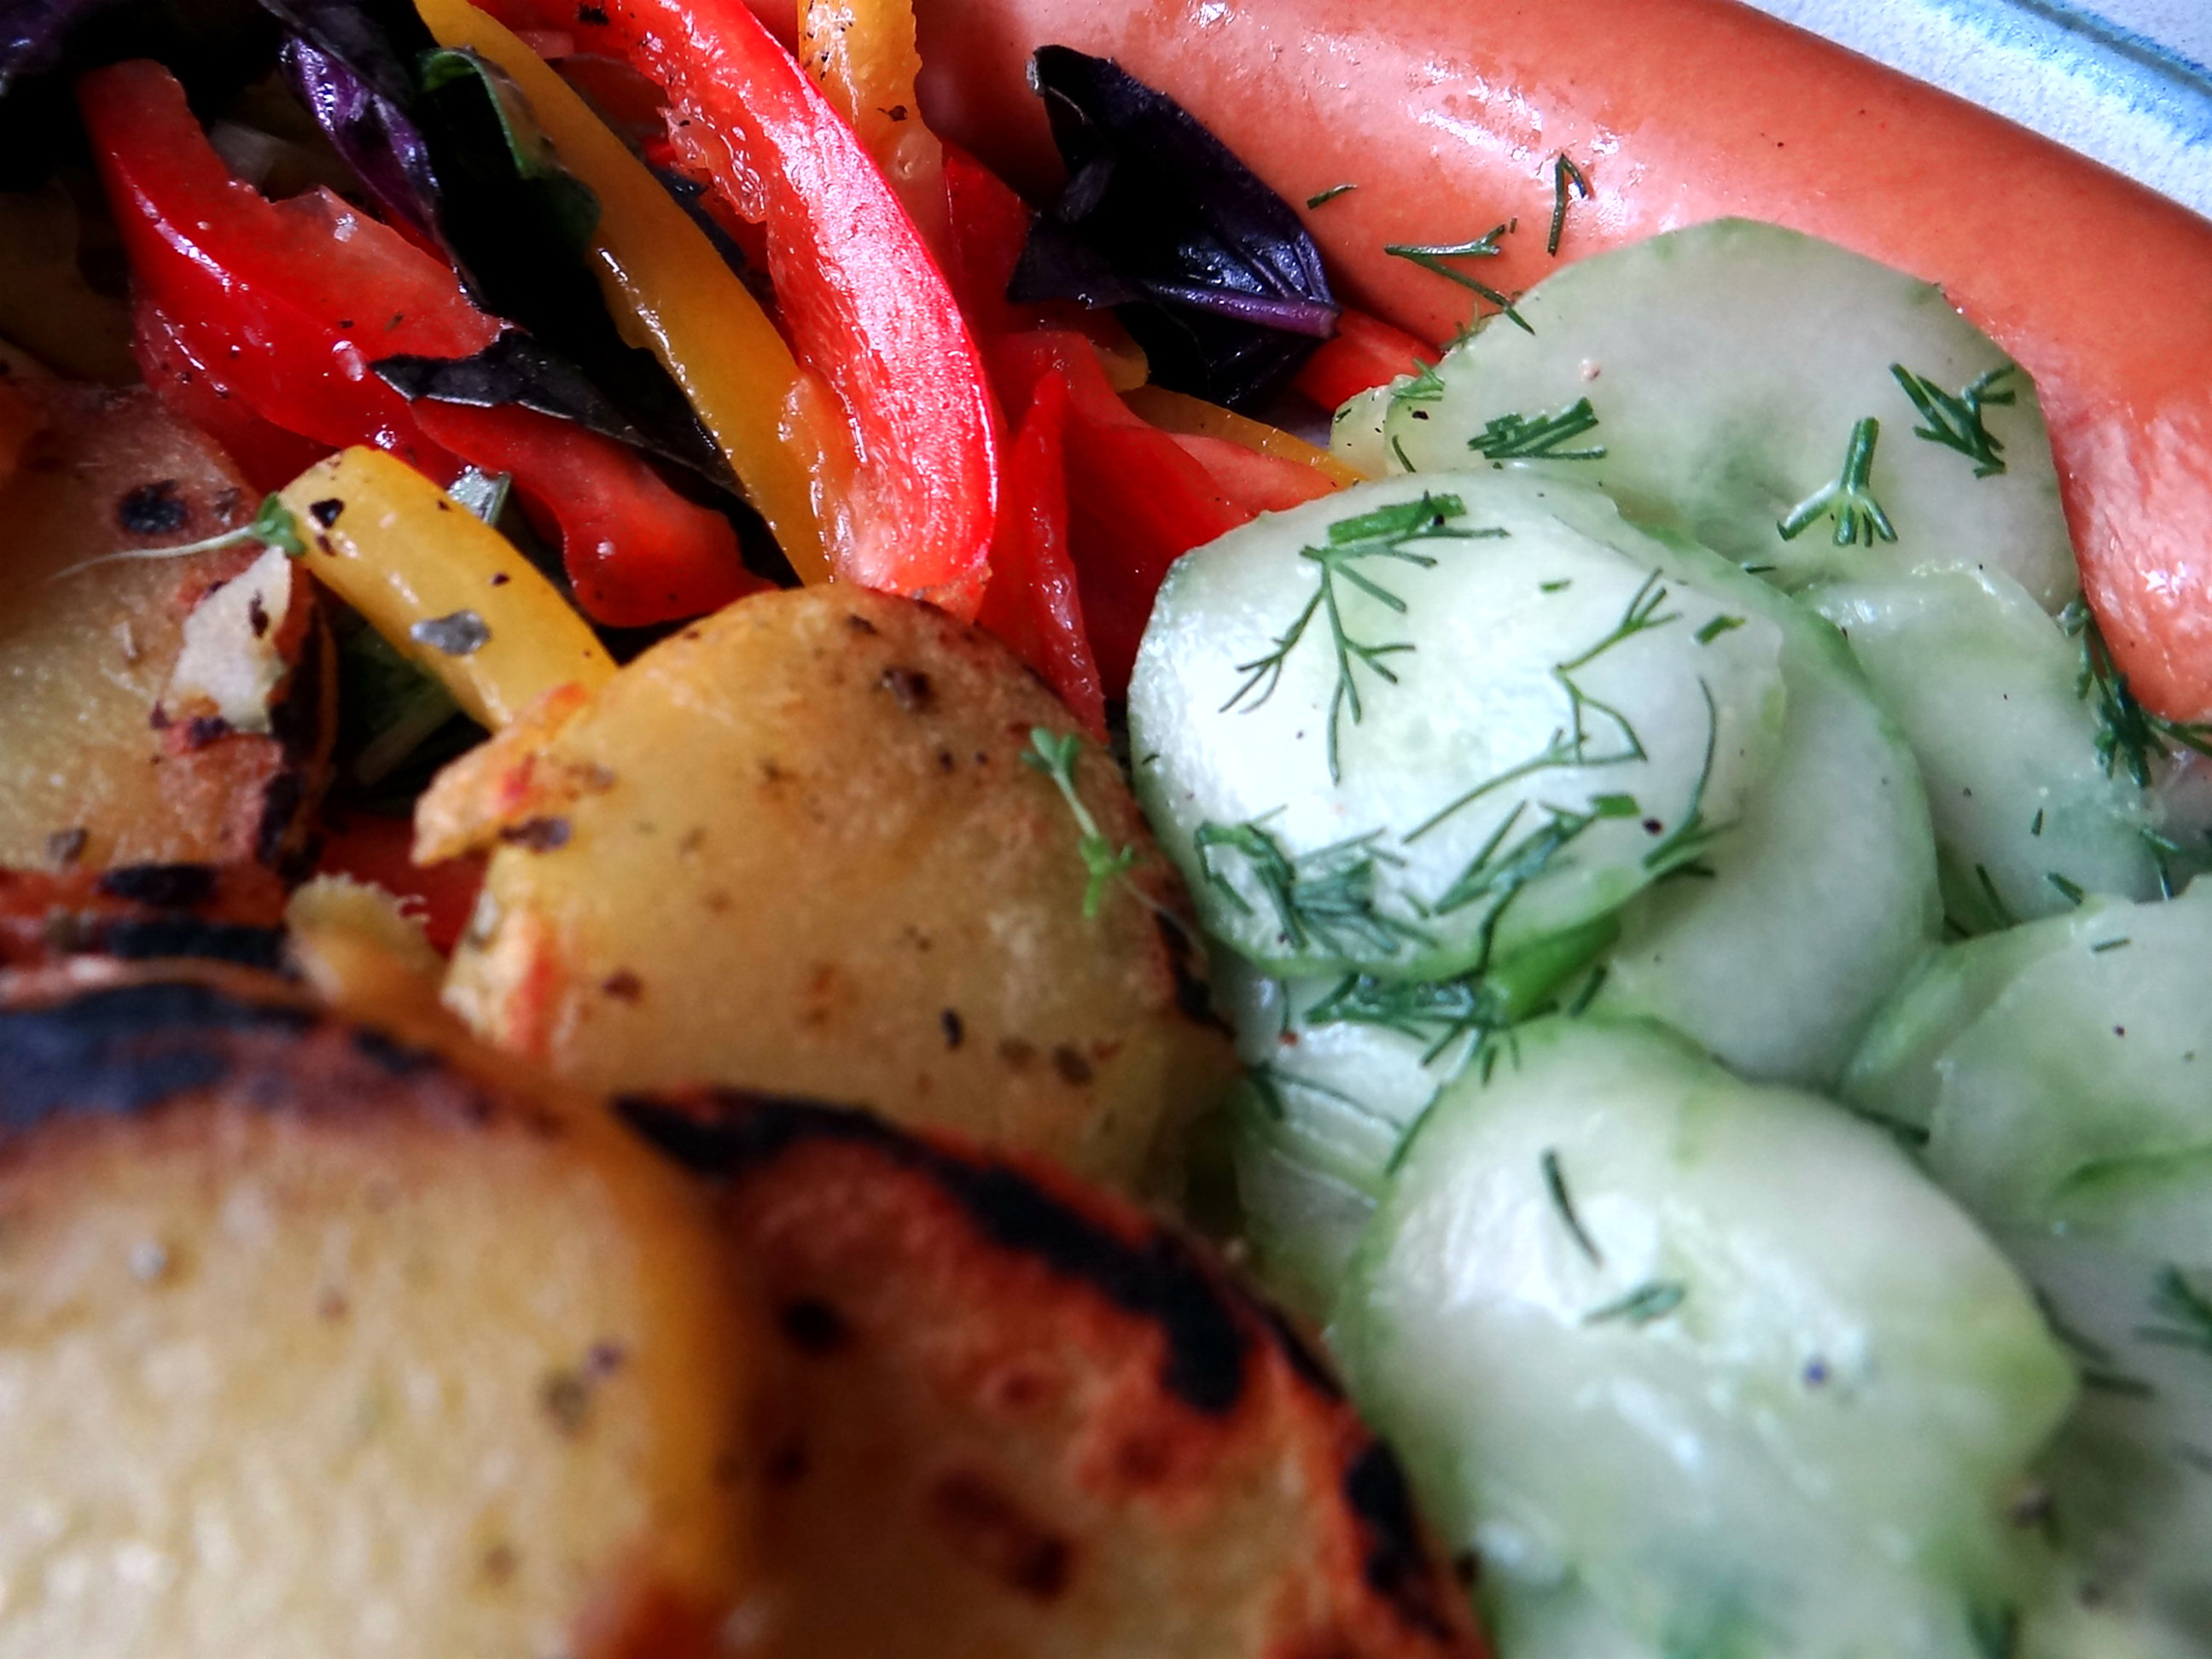 Bratkartoffel,Bockwurst,Salate (2)